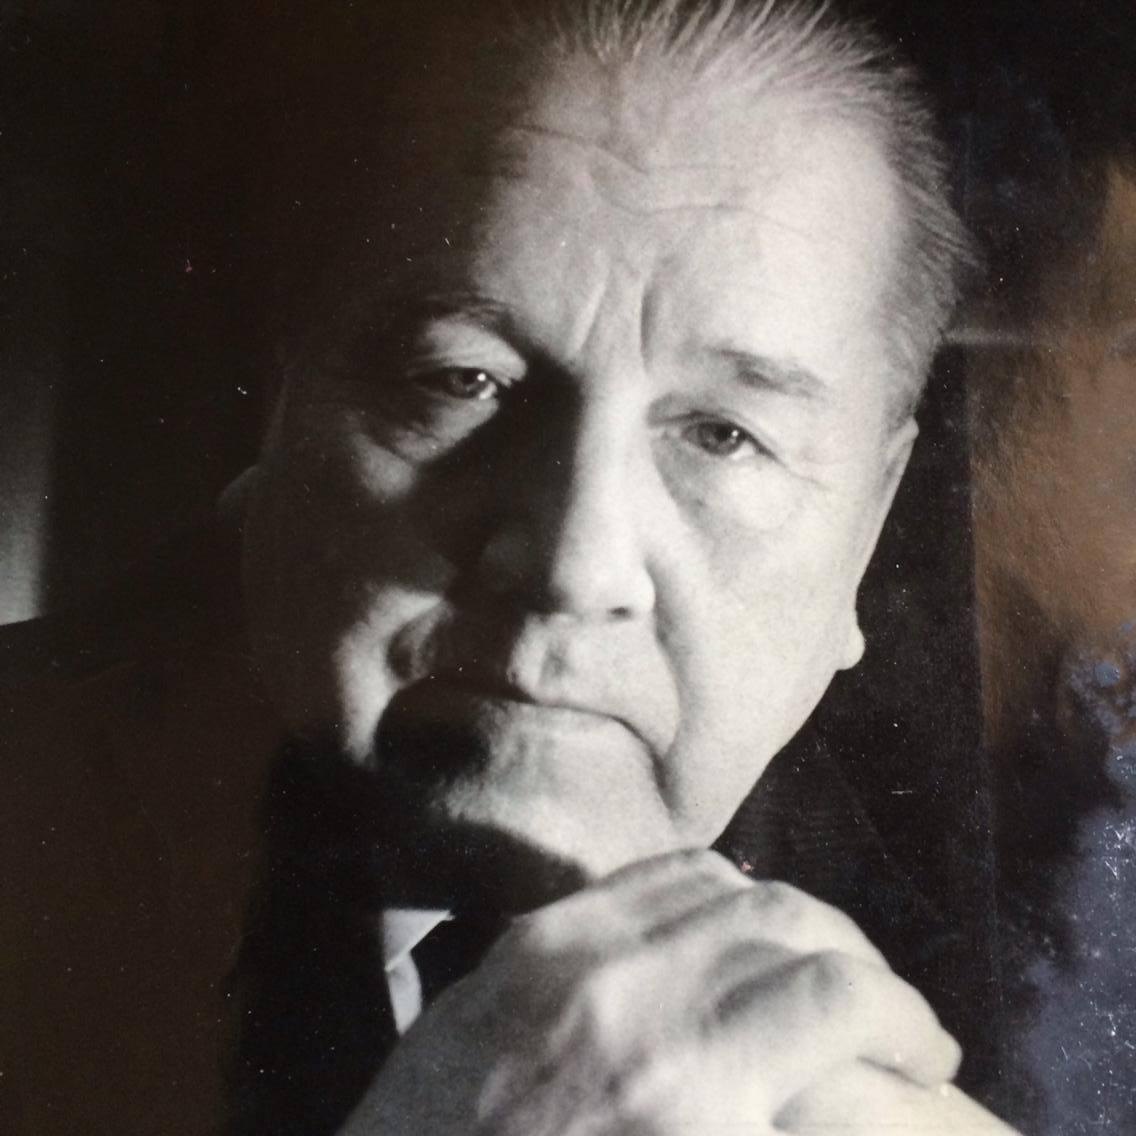 Viktor Afanasiev (1917-1987), People's Artist of Ukraine, a<em>c</em>tor, dire<em>c</em>tor, artisti<em>c</em> and managing dire<em>c</em>tor of the Kharkiv State Puppet Theatre, tea<em>c</em>her, organizer and <em>c</em>hairman of the Department of Puppet Theatre at Kharkiv Institute of Arts. Photo: O. Vyshkin